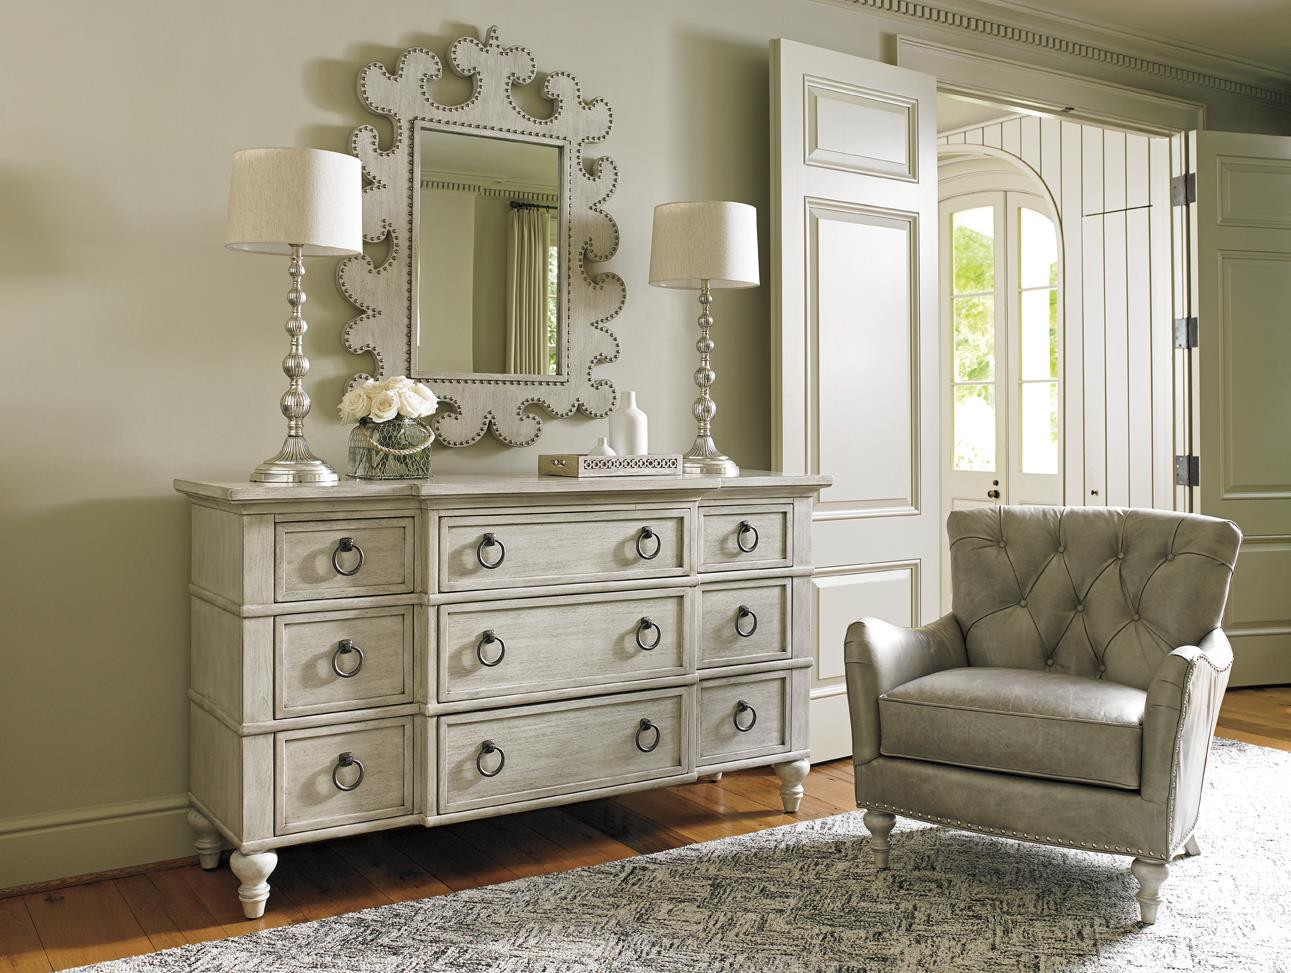 Lexington oyster bay 714 233 barrett nine drawer dresser - Lexington oyster bay bedroom furniture ...